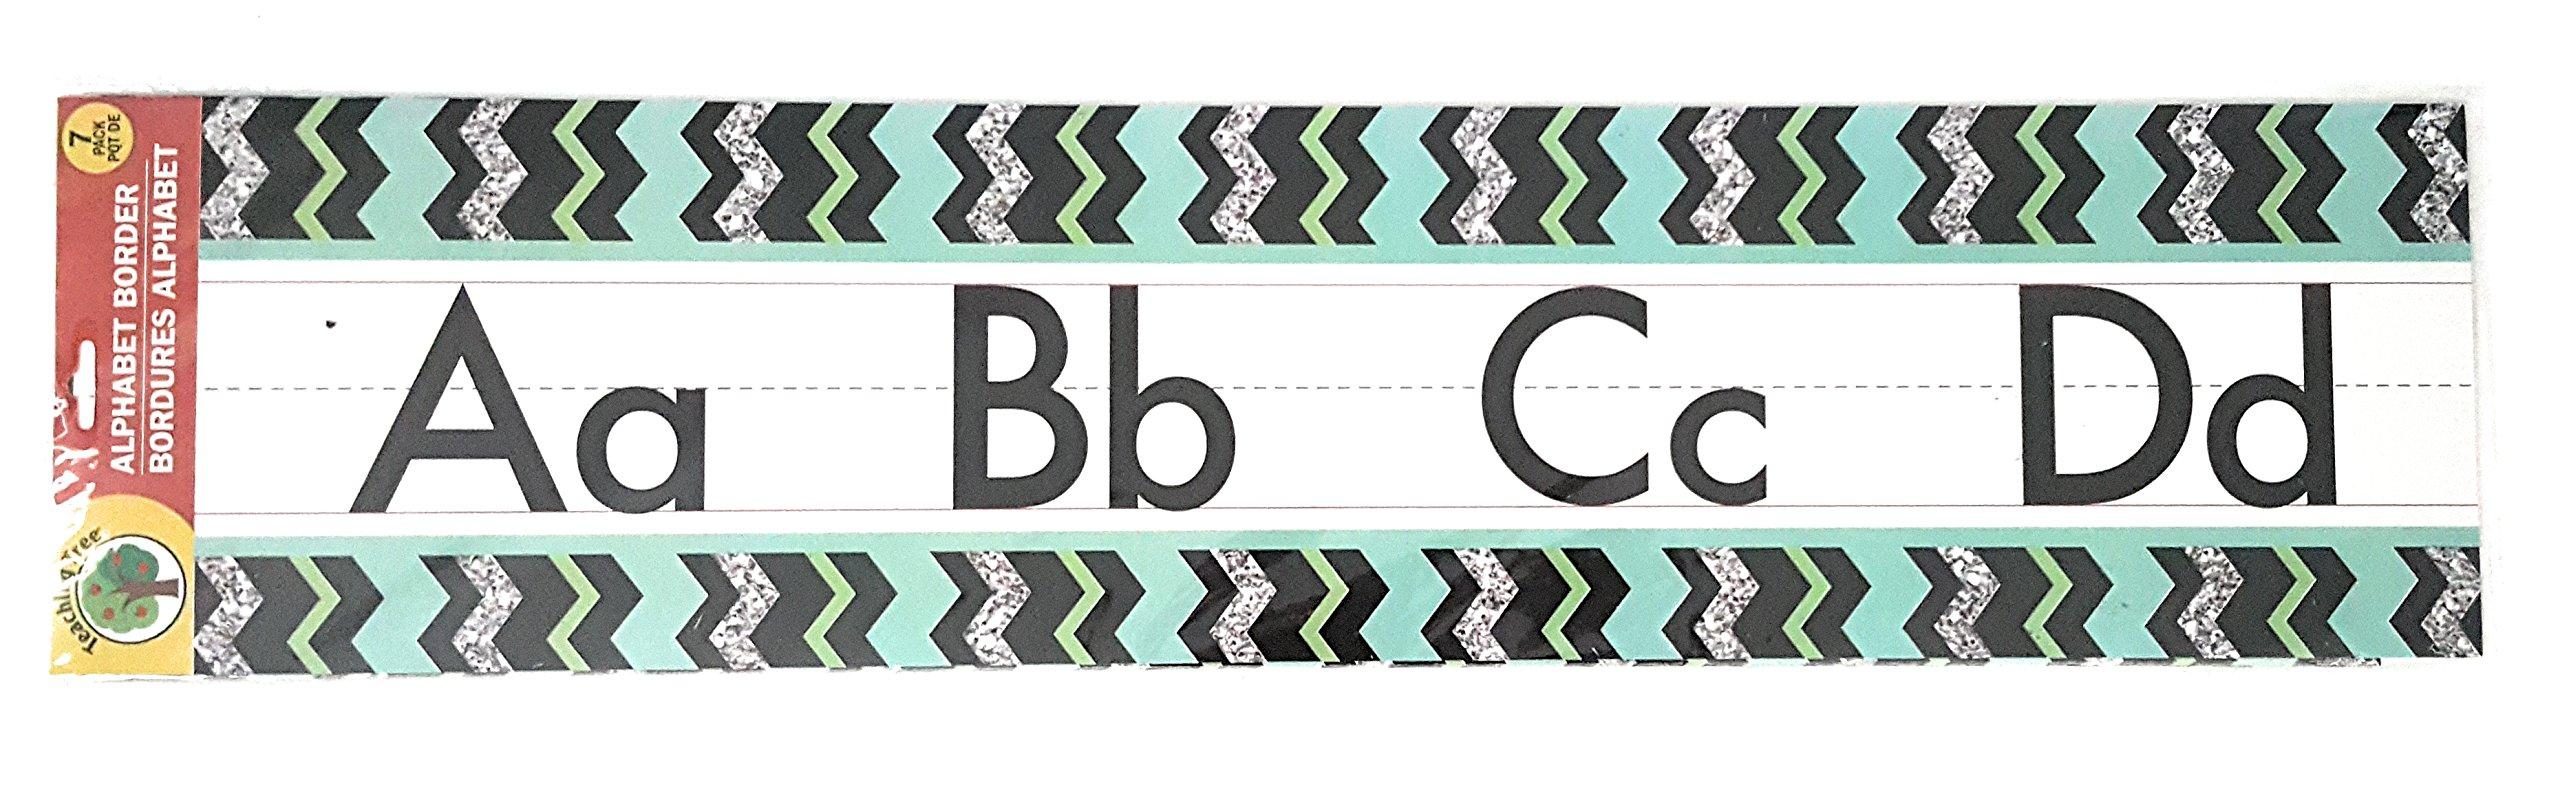 Teaching Tree Manuscript Alphabet Bulletin Back to School Board Creative Strips School Office Resources Scholastic Teacher Teacher's Bulletin Trim Wall Border Decal Classroom Decoration Black Zigzag 2